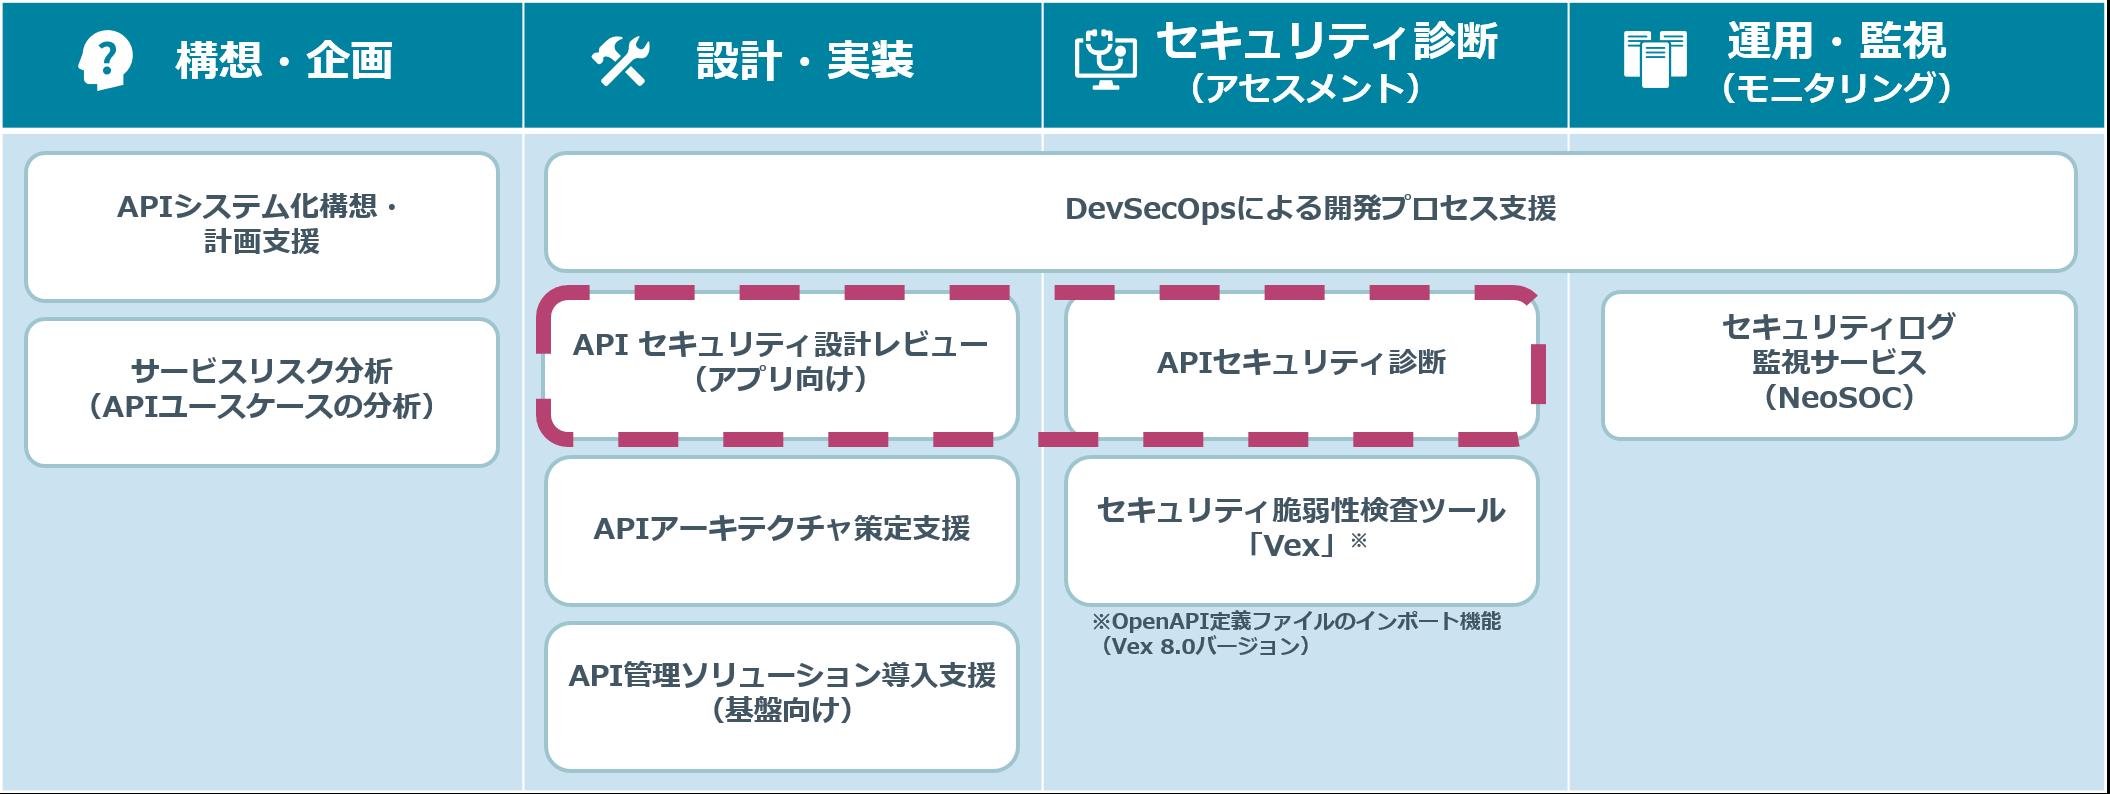 20191218_news_api_02